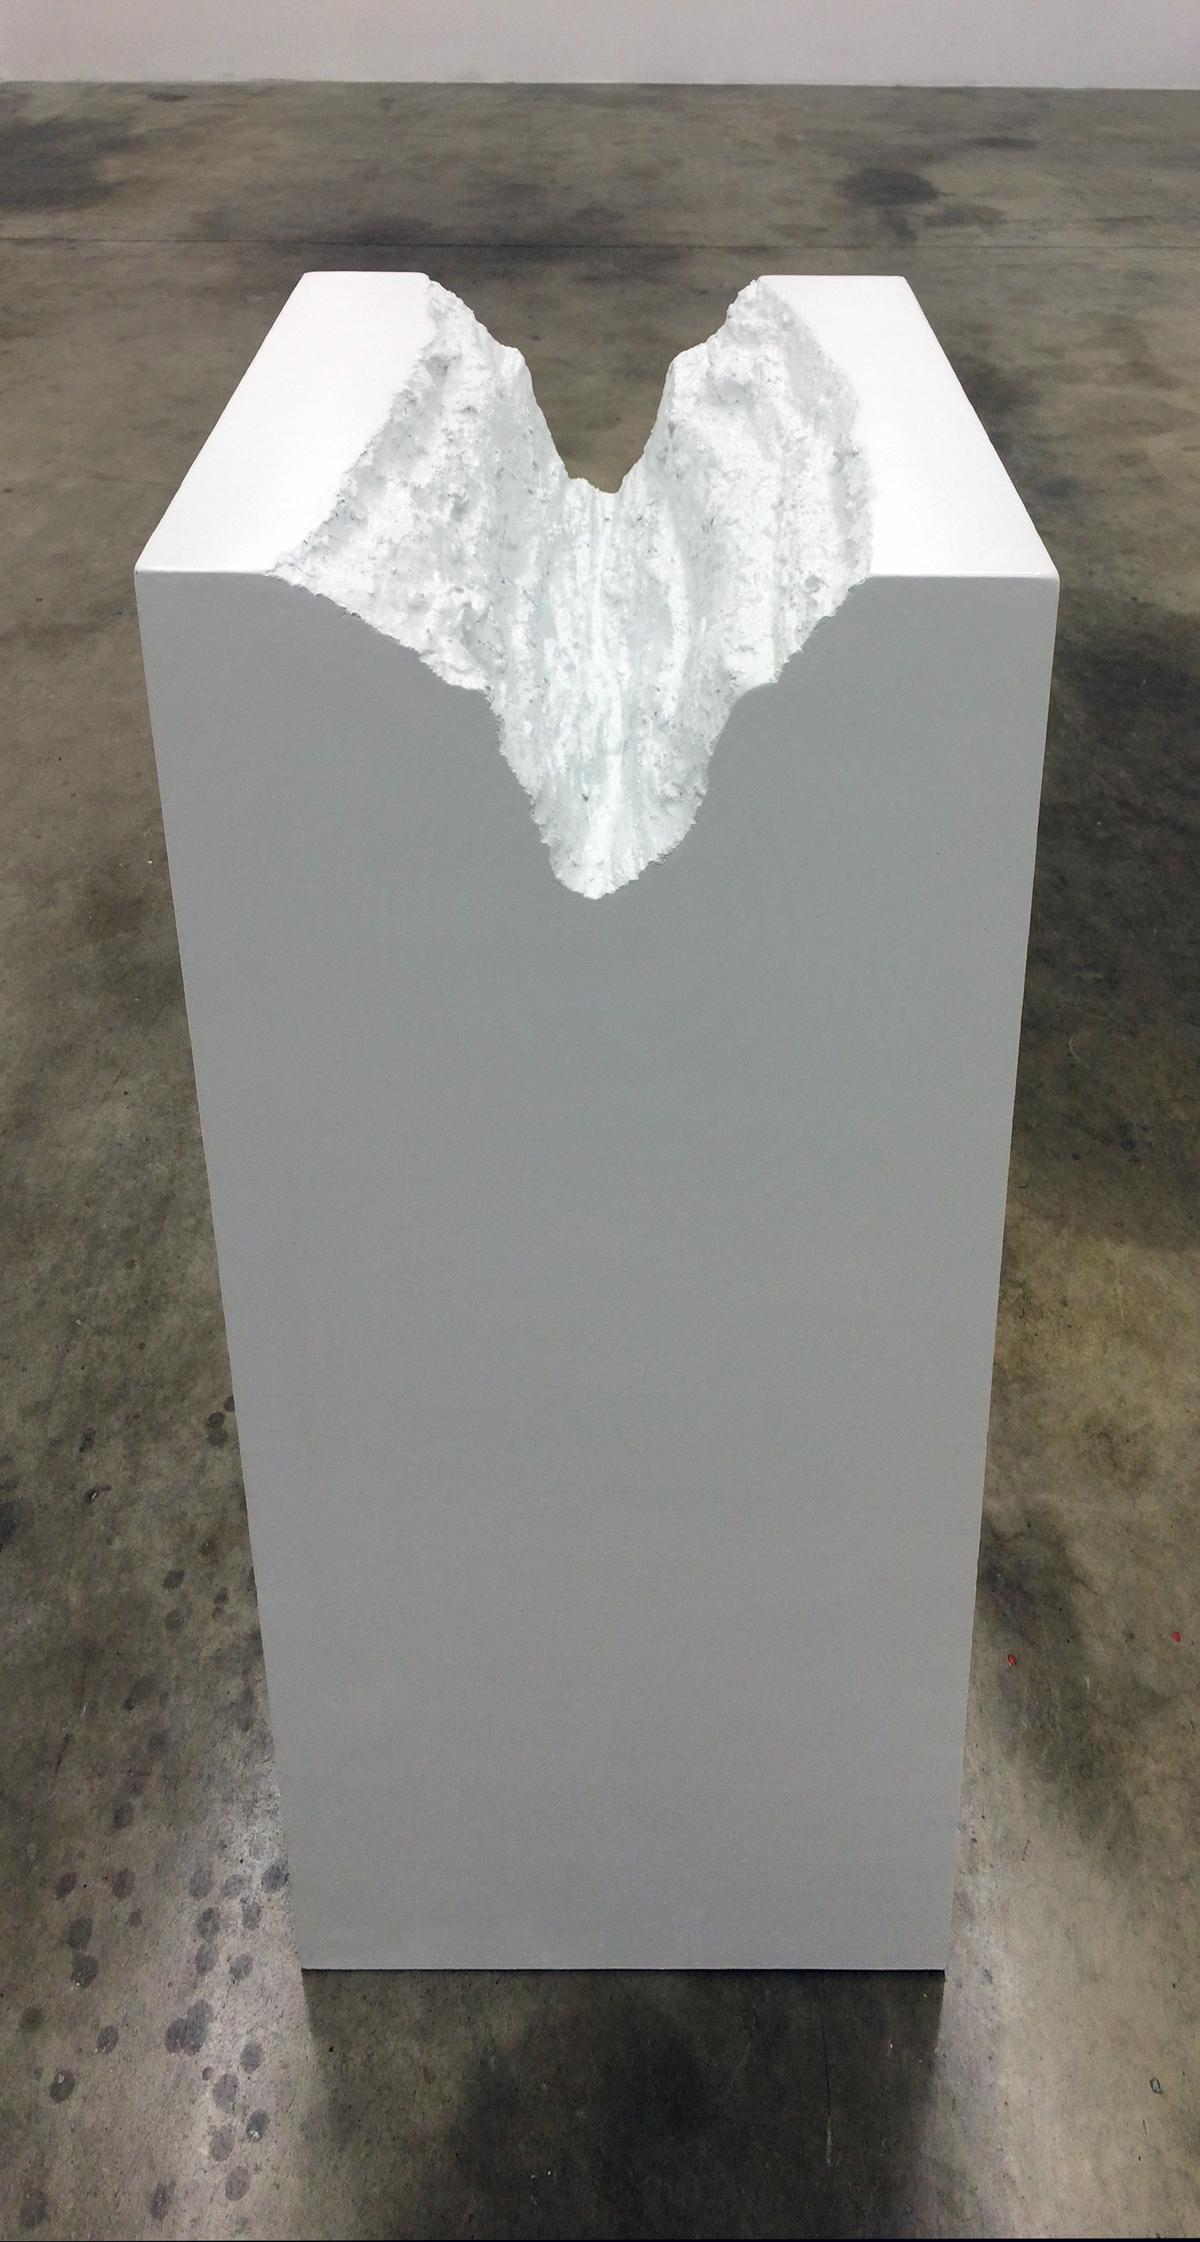 Rio Grande Gorge (Pedestal) , 2014 MDF, Urethane, Silicone, and enamel 43 x 20 x 20 inches